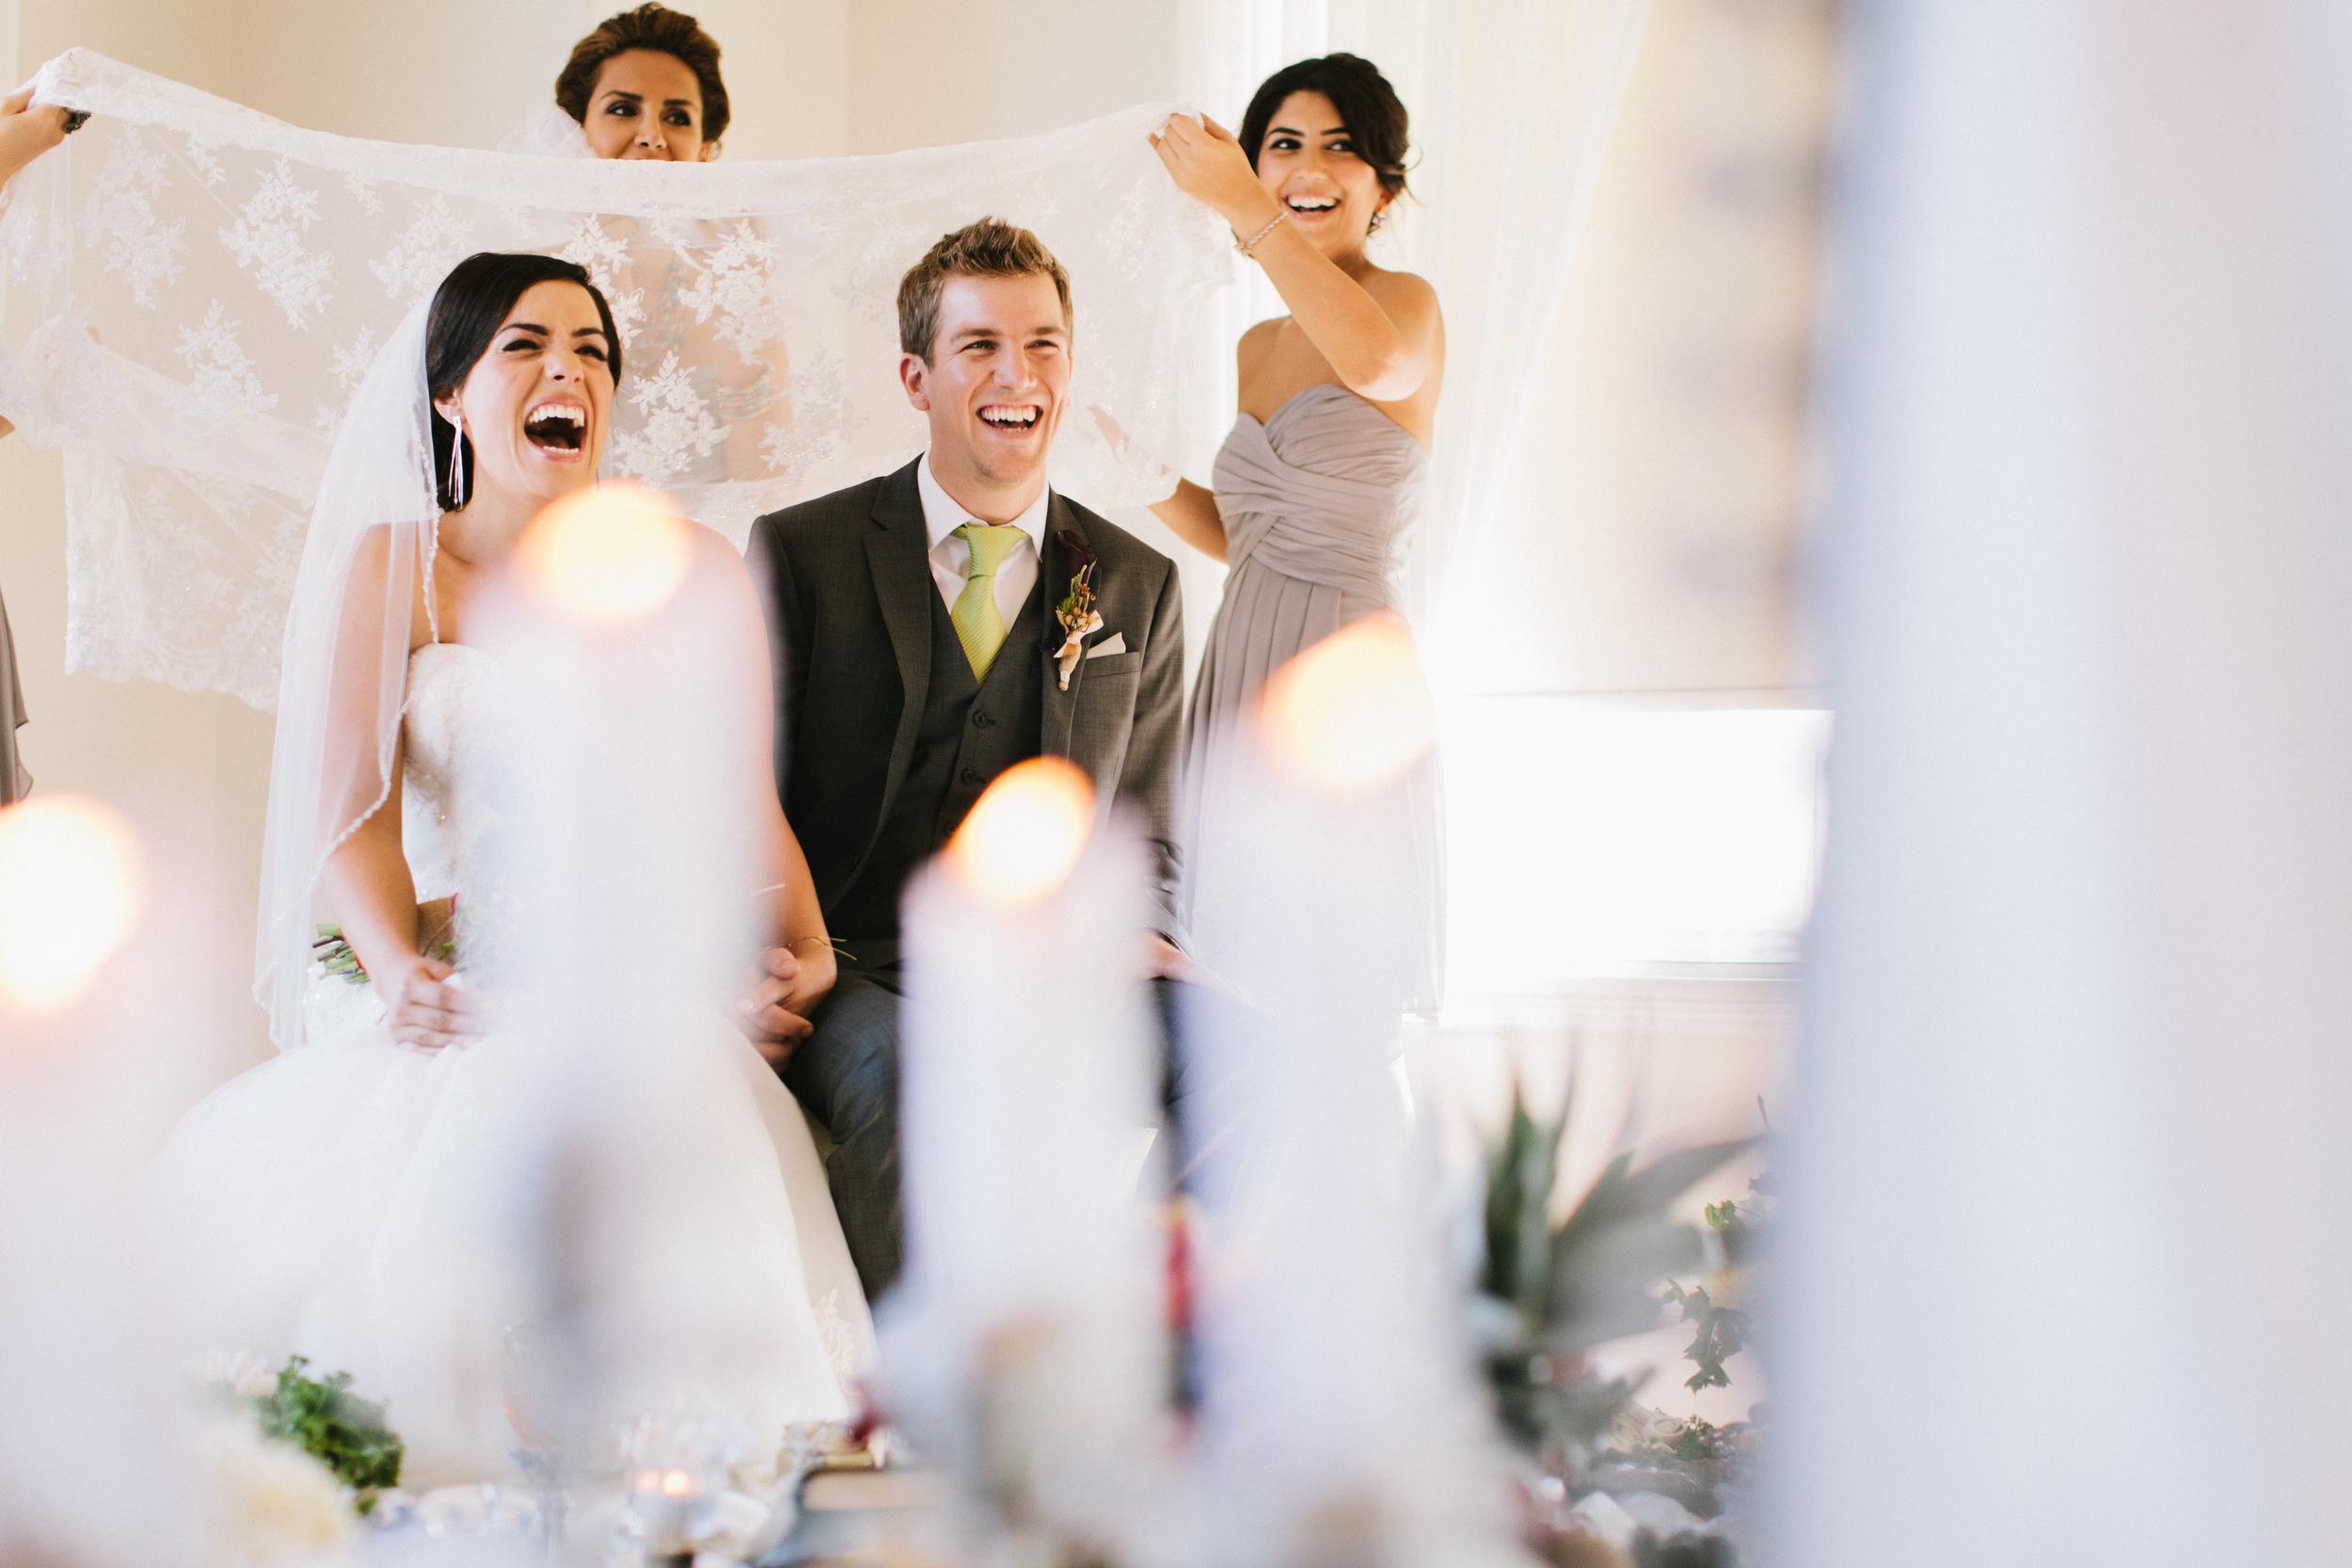 harbour-banquet-hall-oakville-wedding-photographer-michael-rousseau-photography-persian-wedding-photographer-isabella-daniel021.JPG